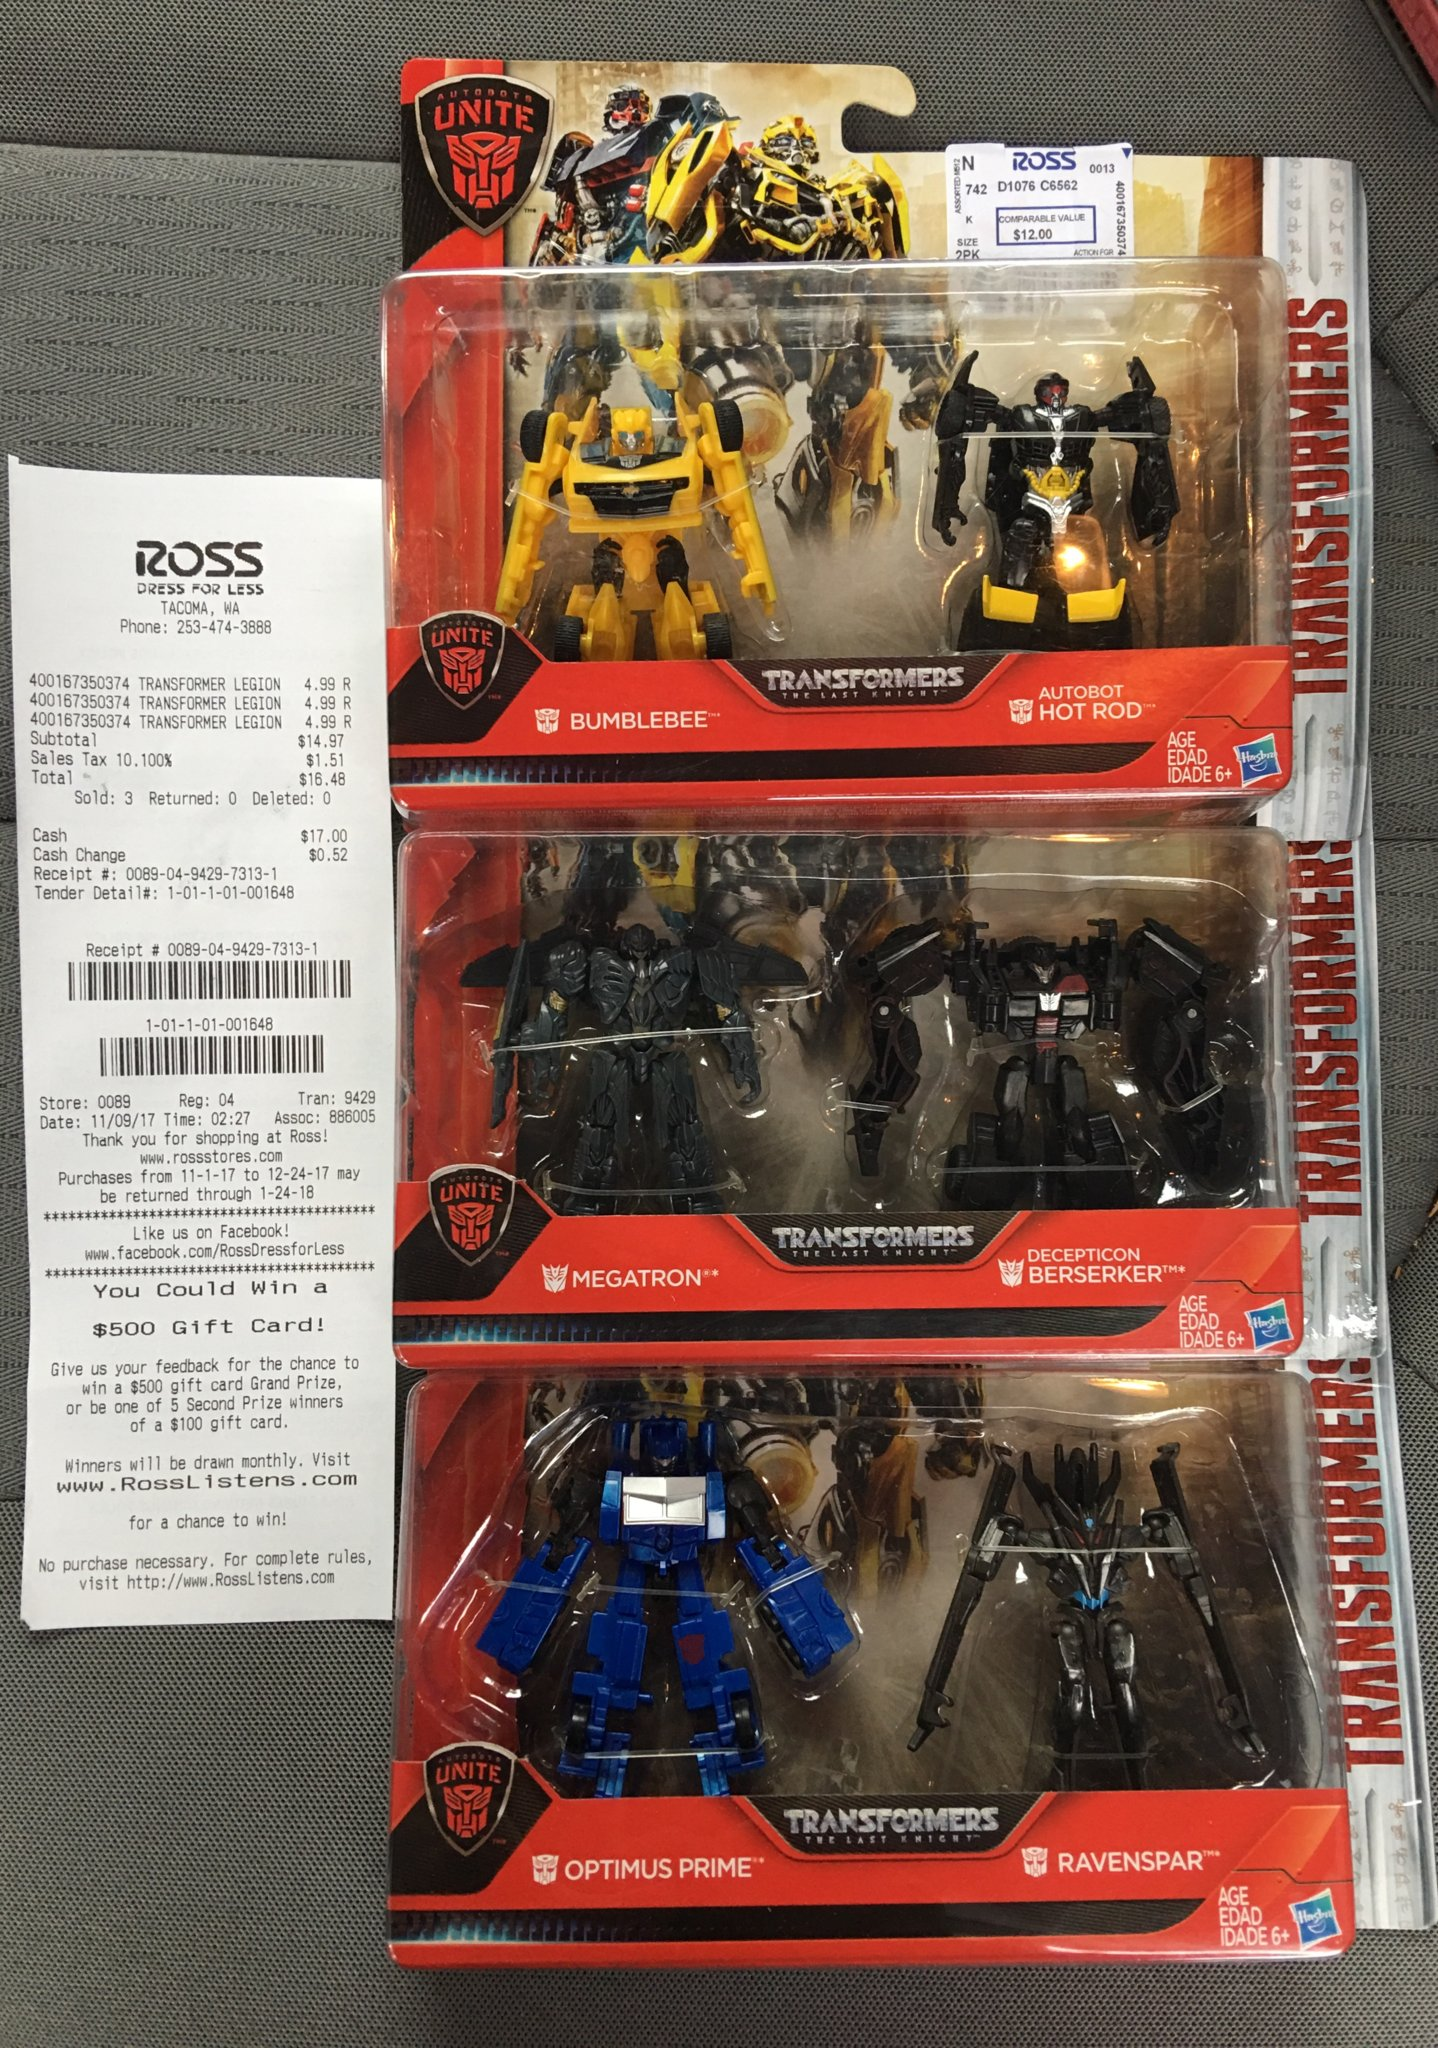 Transformers The Last Knight Autobots Unite Legion Class